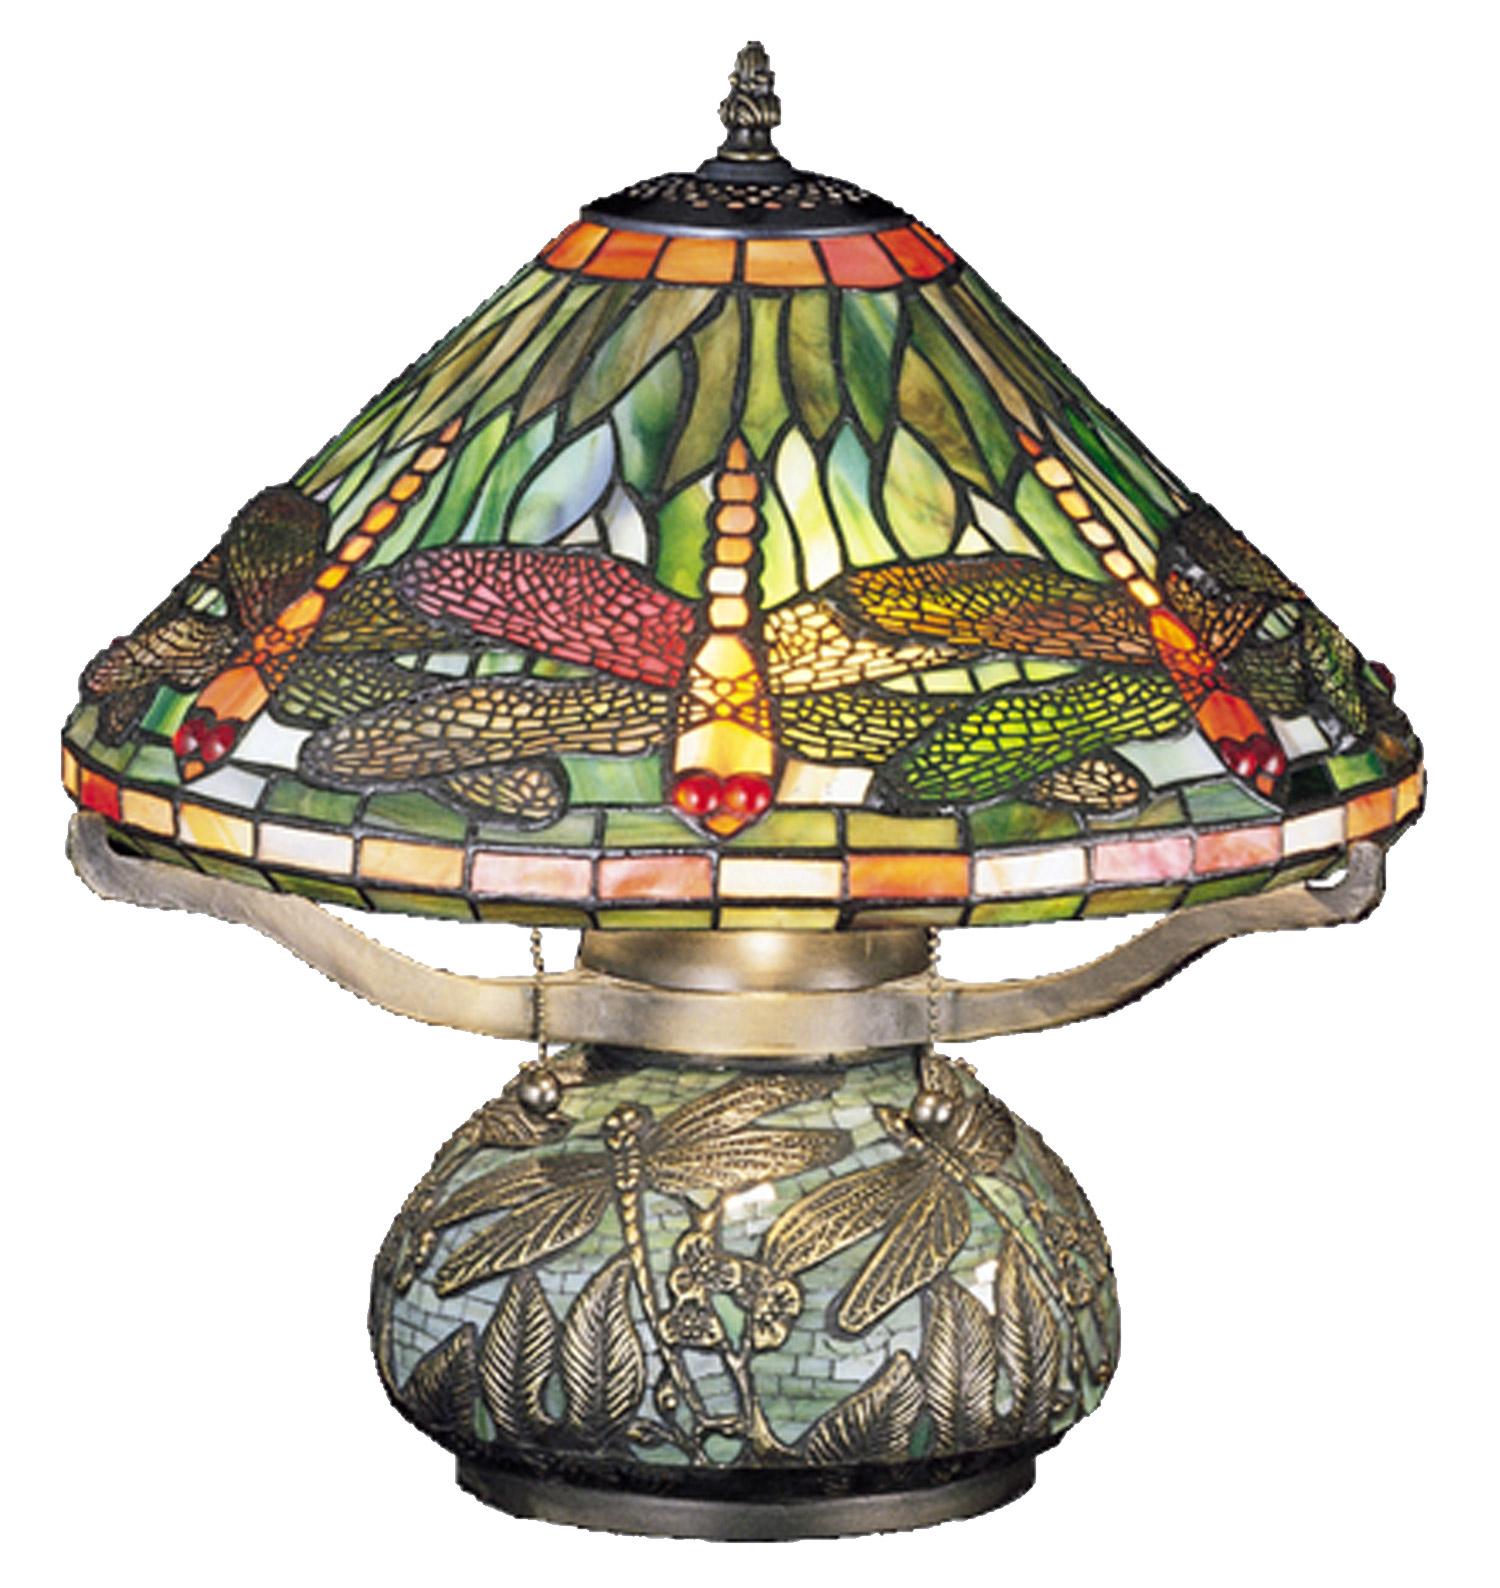 Meyda 26681 Tiffany Dragonfly WTiffany Mosaic Base Table Lamp